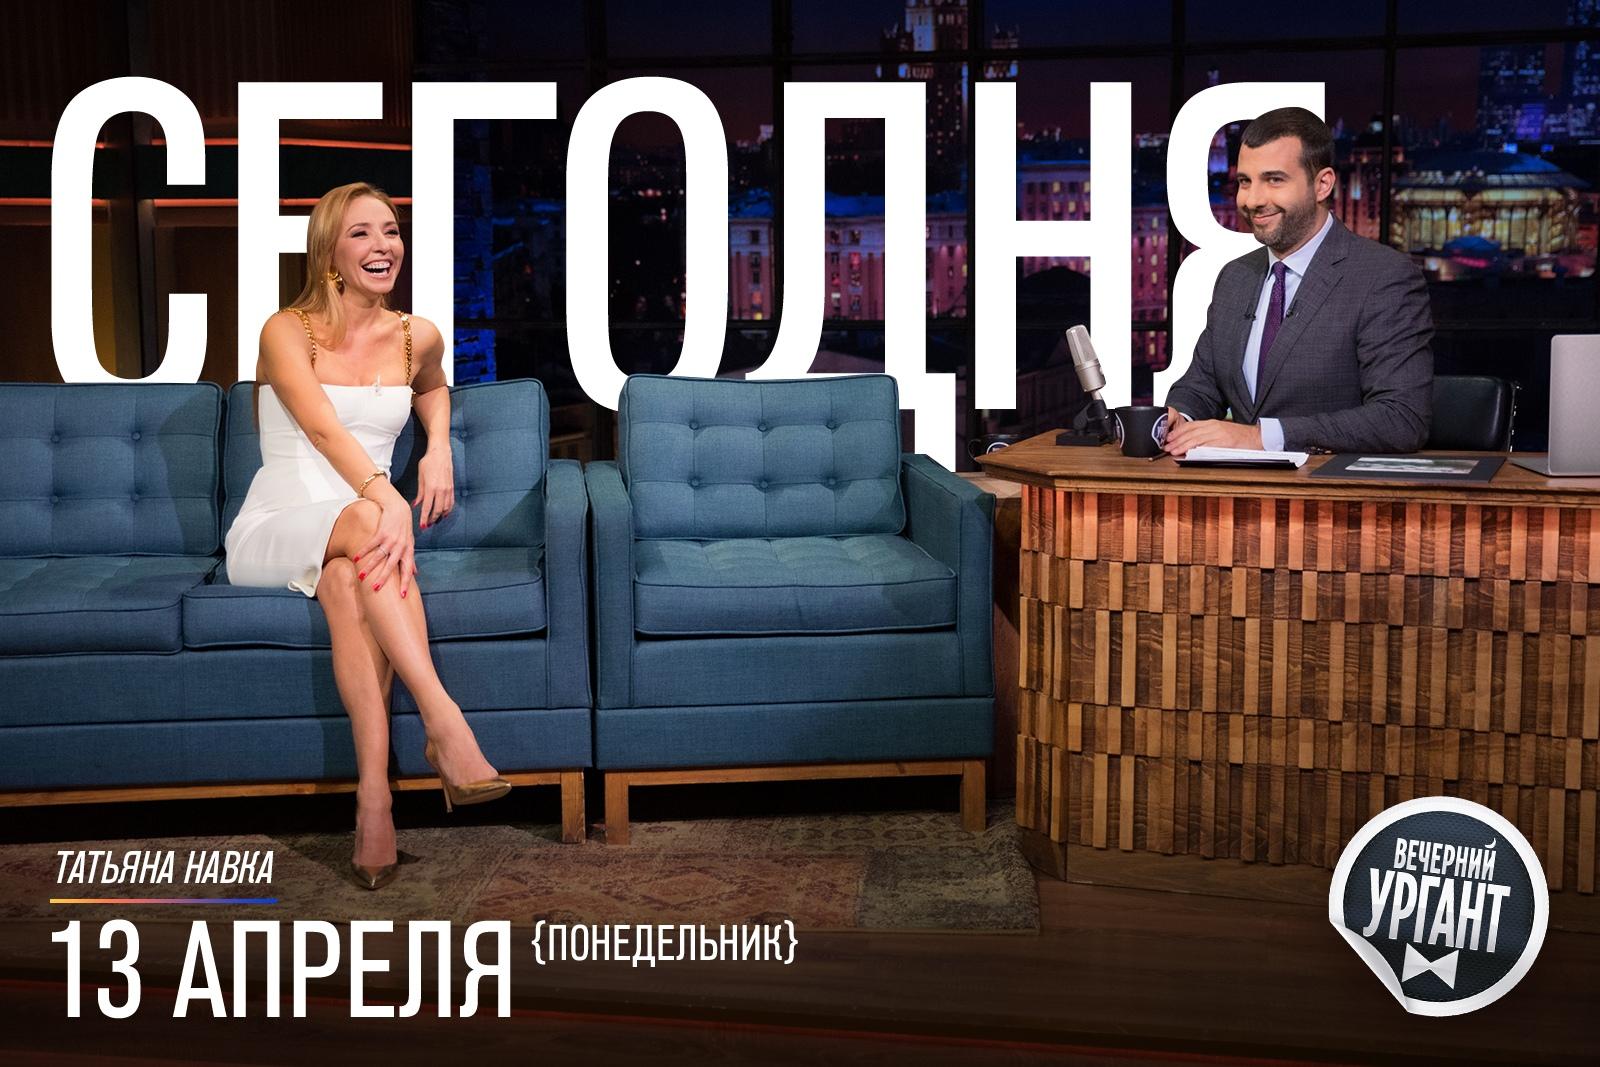 Татьяна Навка на ТВ и радио - Страница 13 5d4zYQEGv60